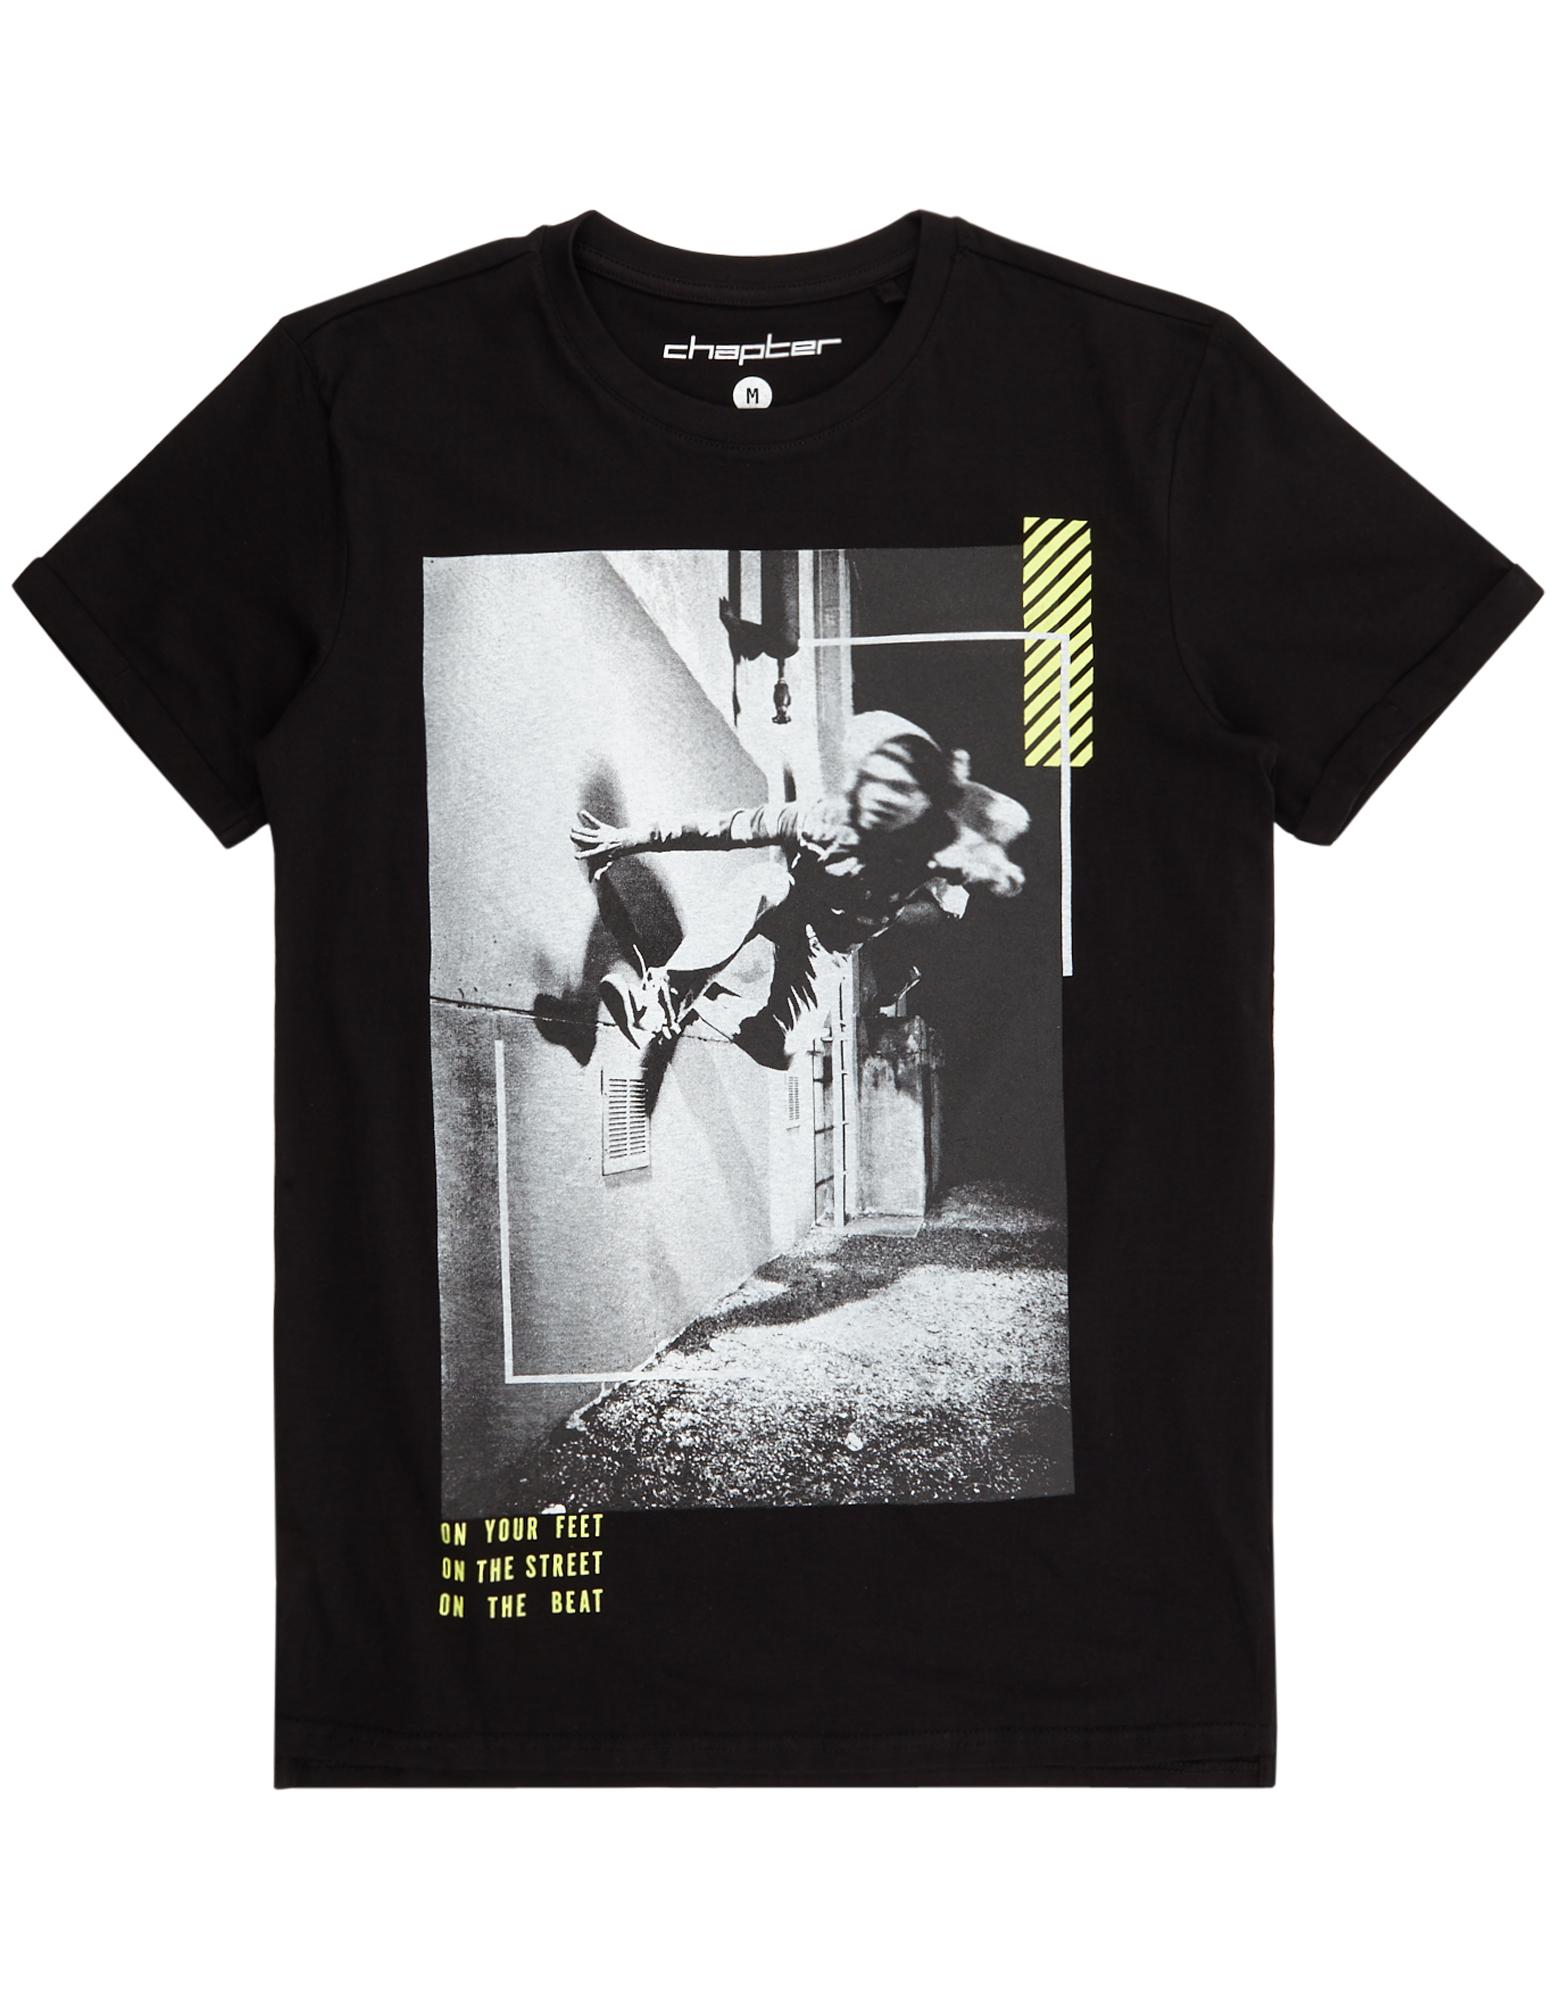 Herren T-Shirt mit Motiv-Print    81502461800304